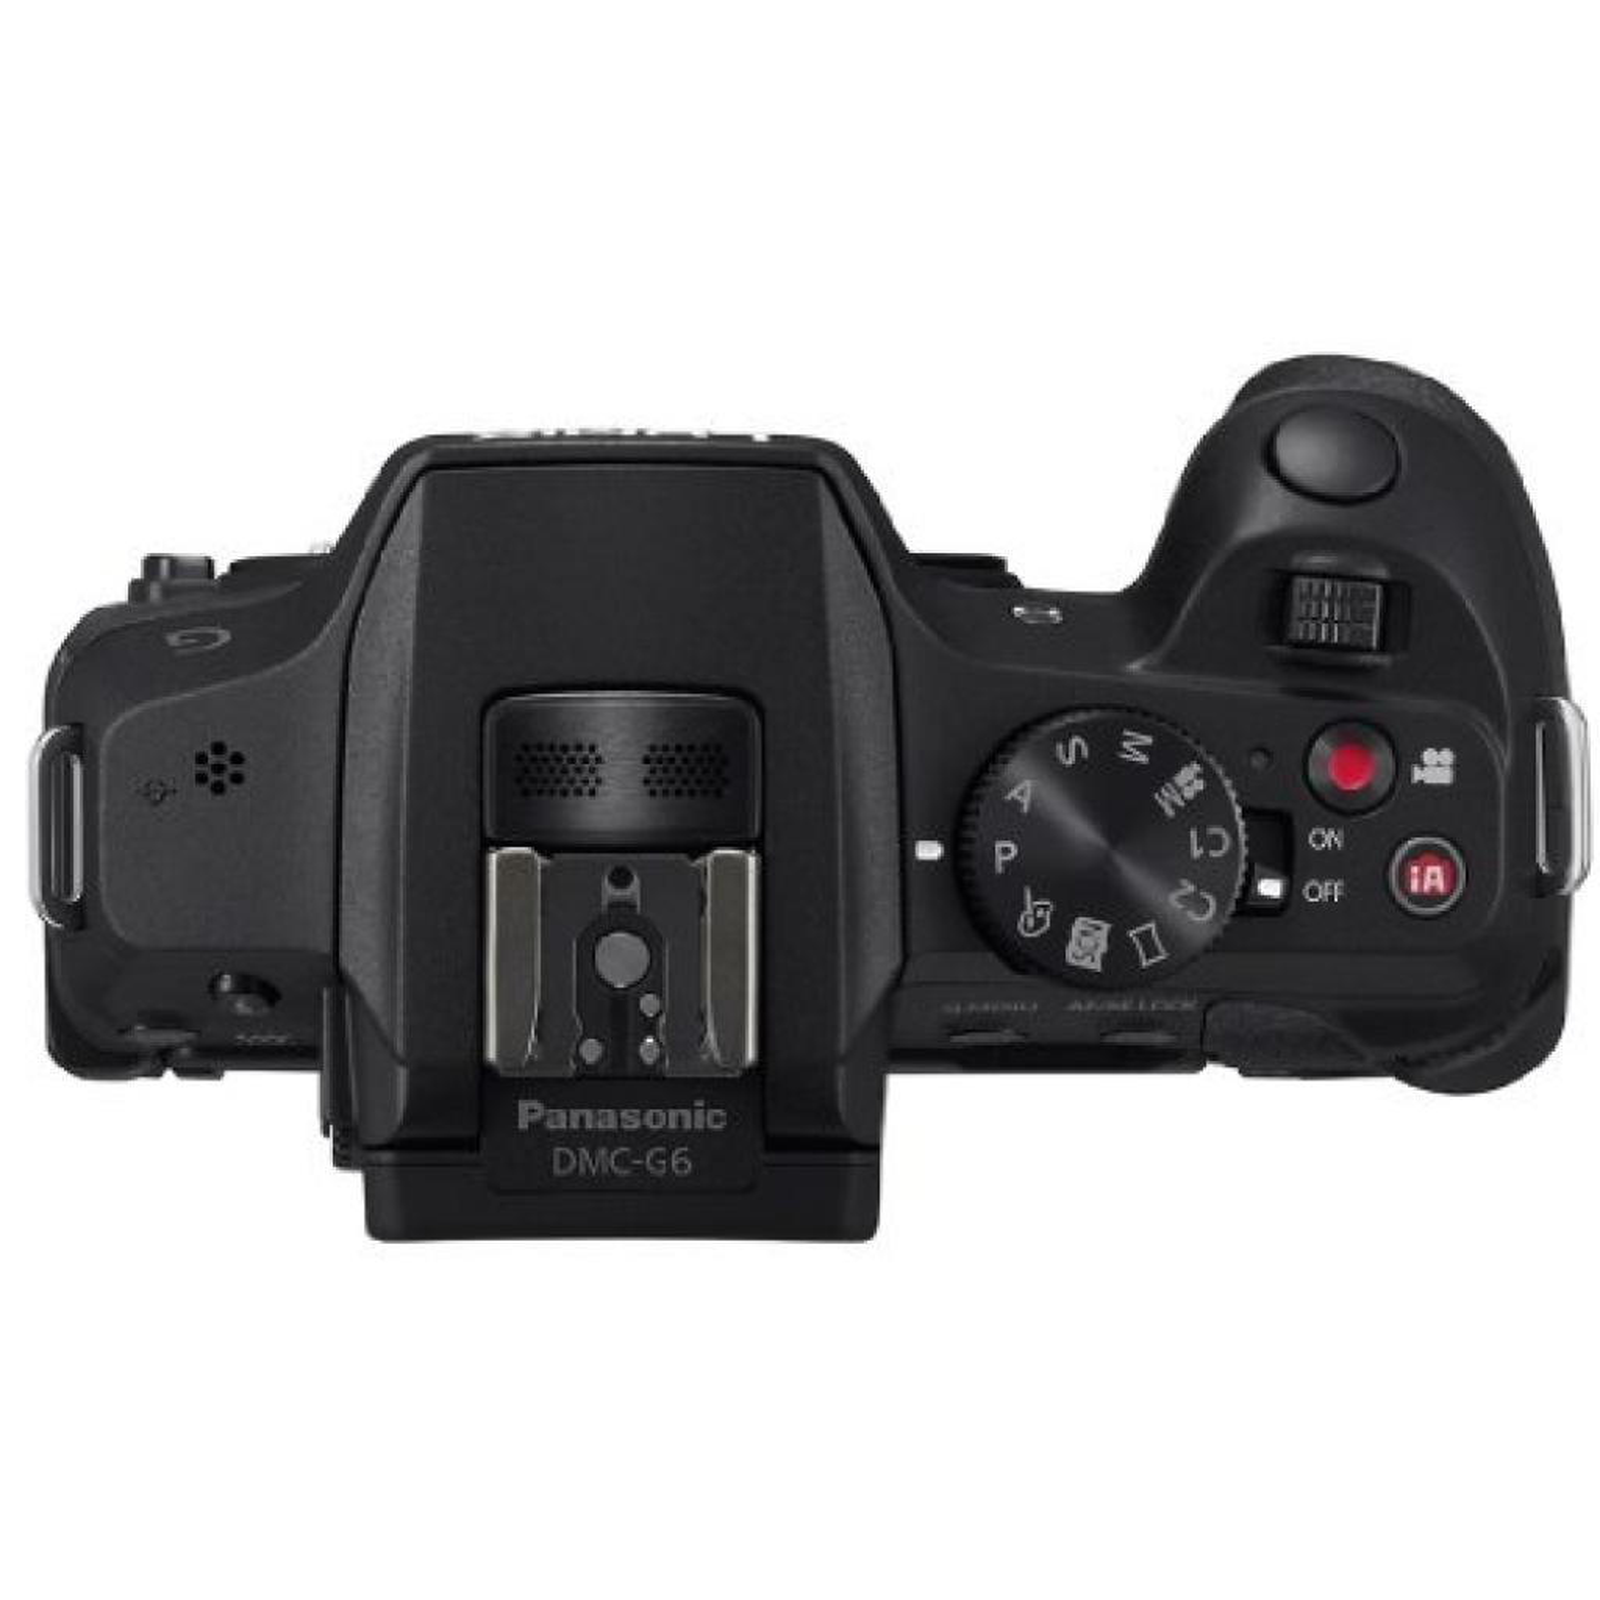 Цифровой фотоаппарат PANASONIC DMC-G6 14-140mm Kit Black (DMC-G6HEE-K) изображение 4